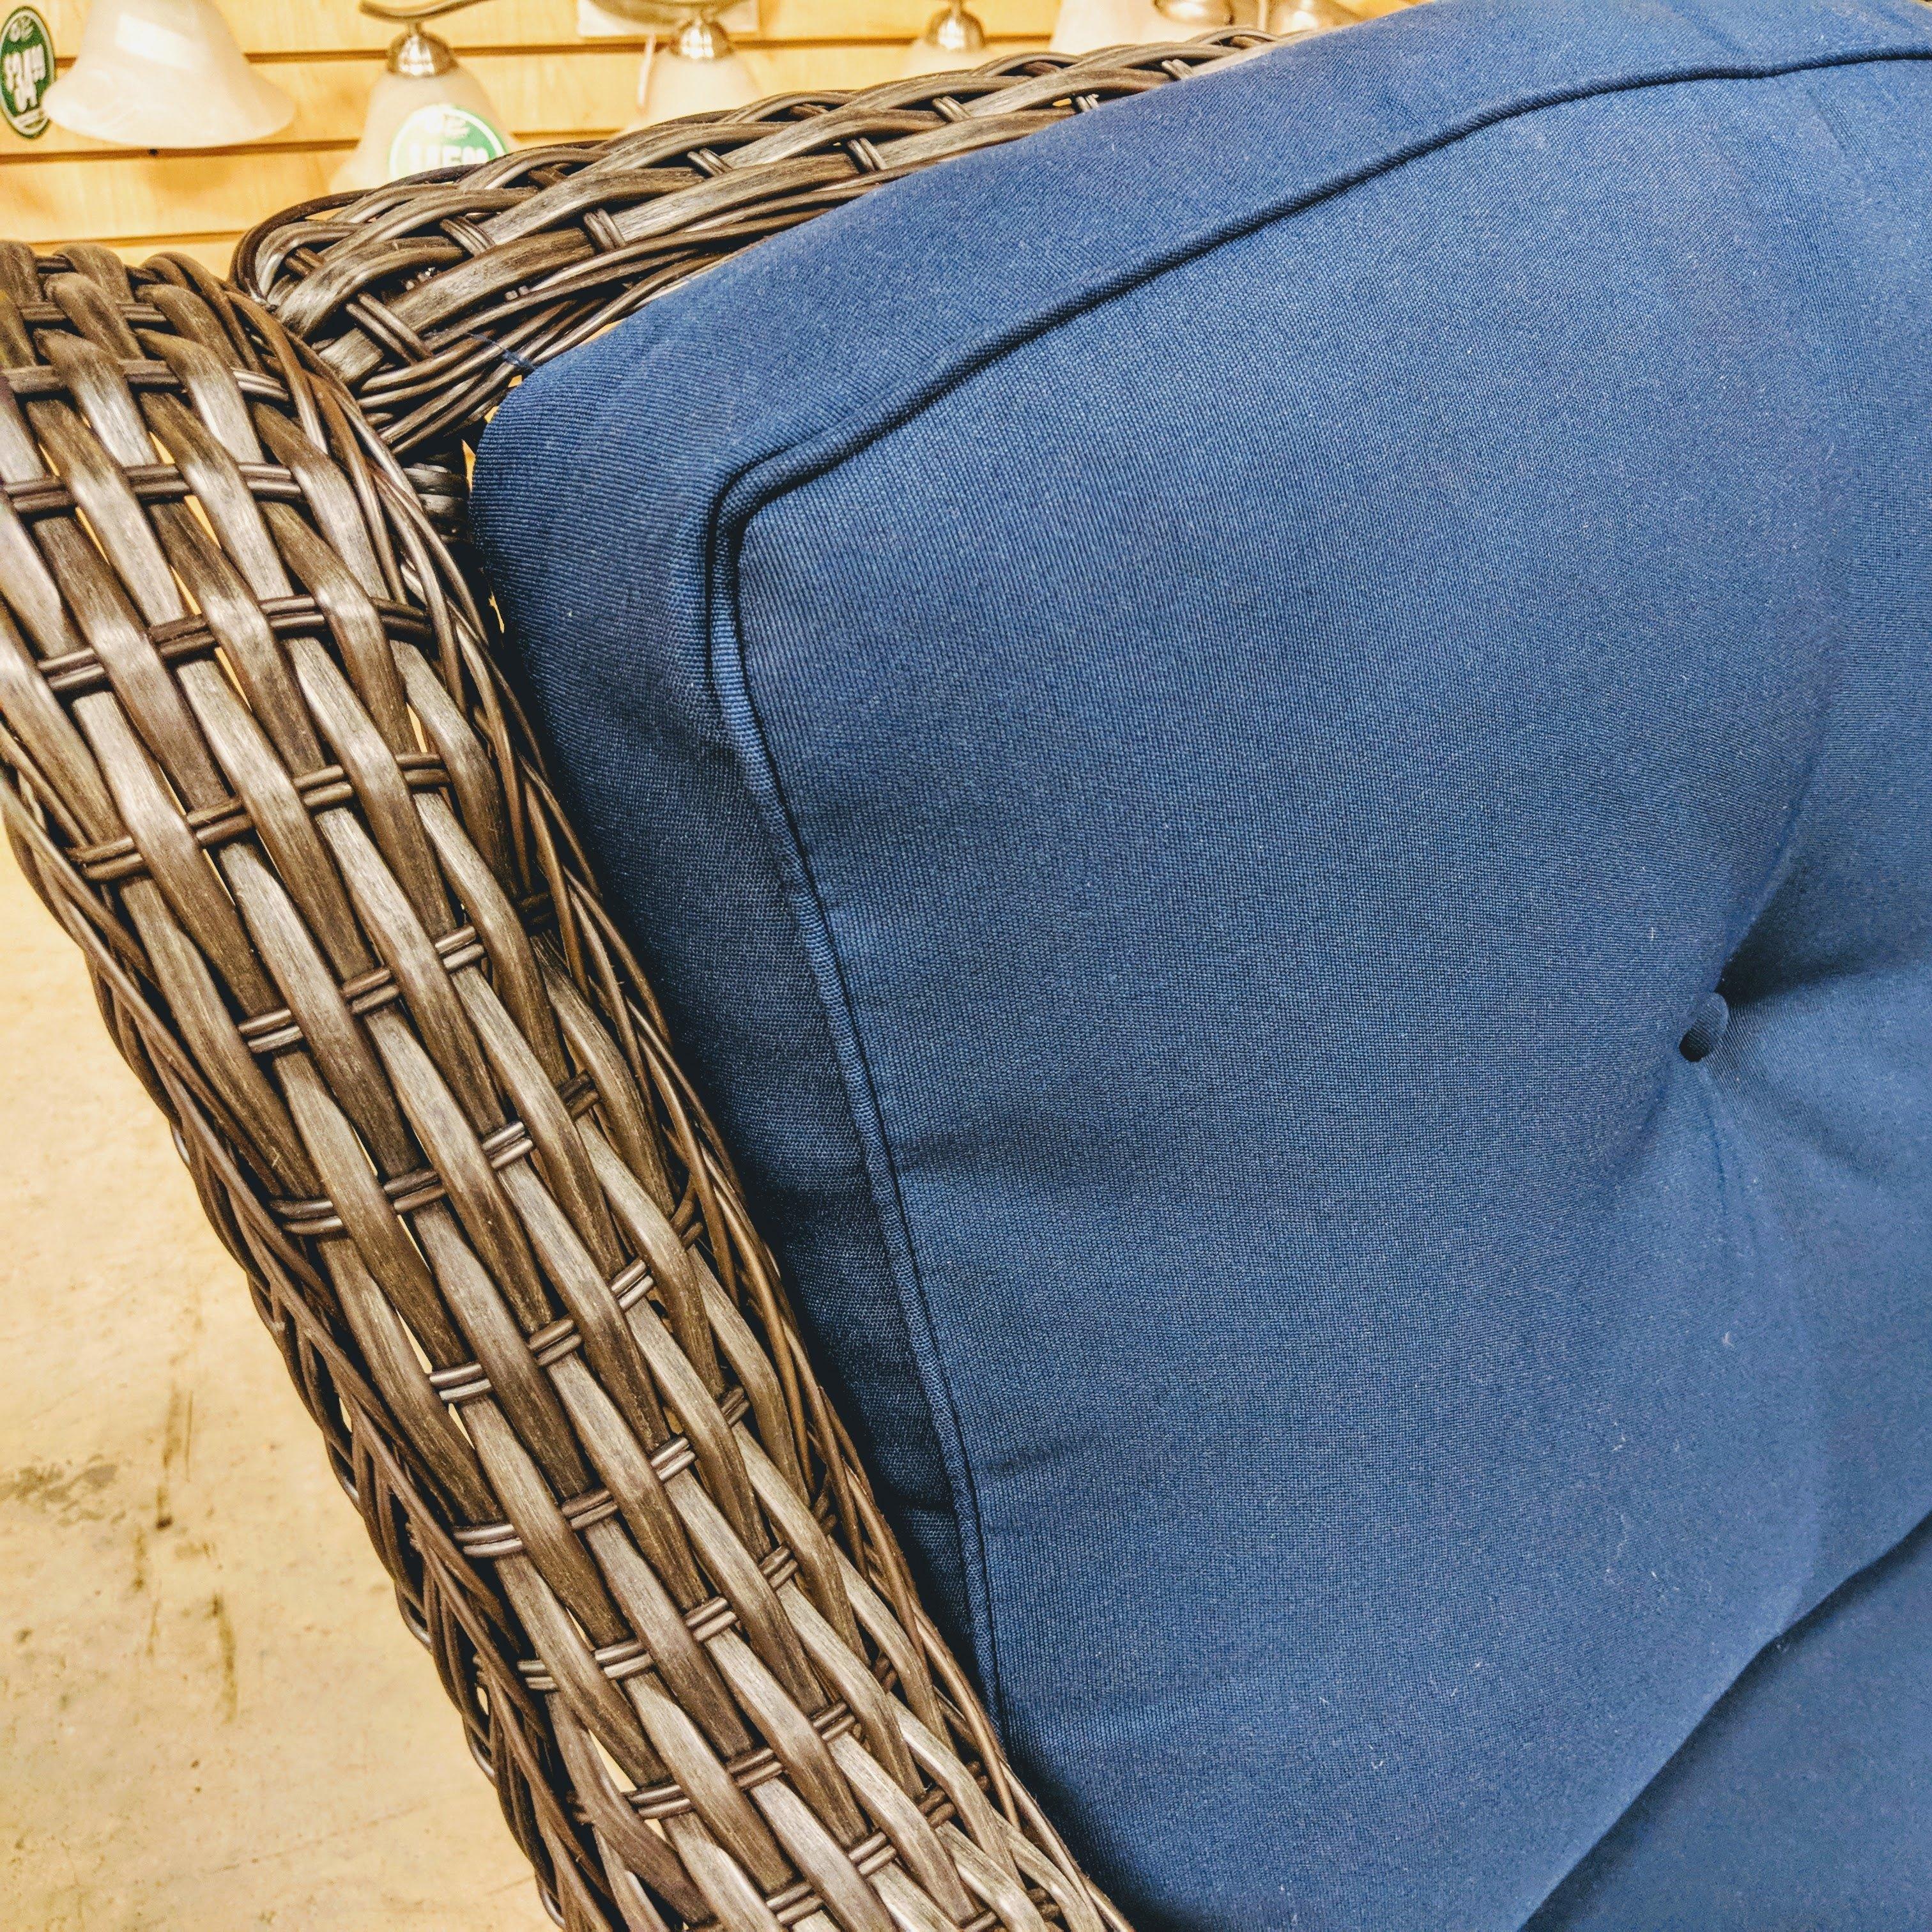 Wicker 3 Piece Swivel Glider Set with Blue Cushion